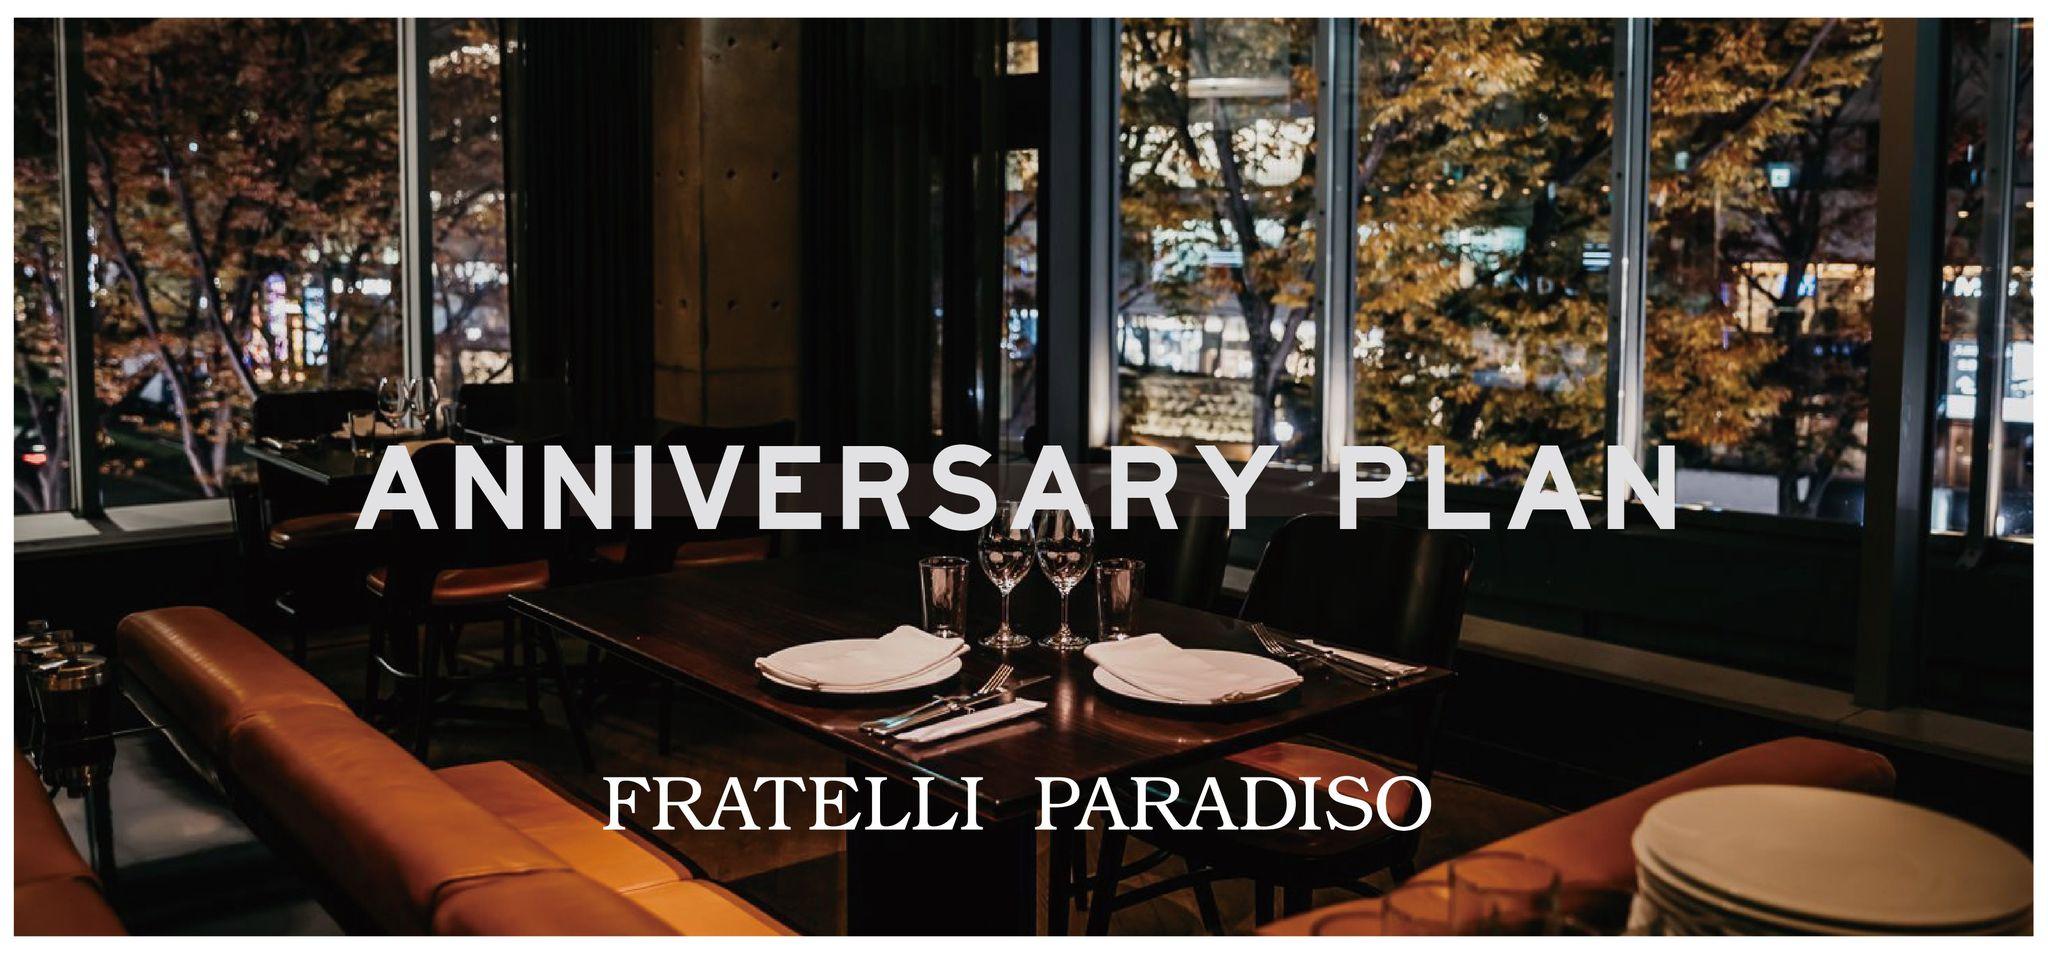 【FRATELLI PARADISO】表参道の黒を基調としたシックな店内でお祝いする特別プラン!